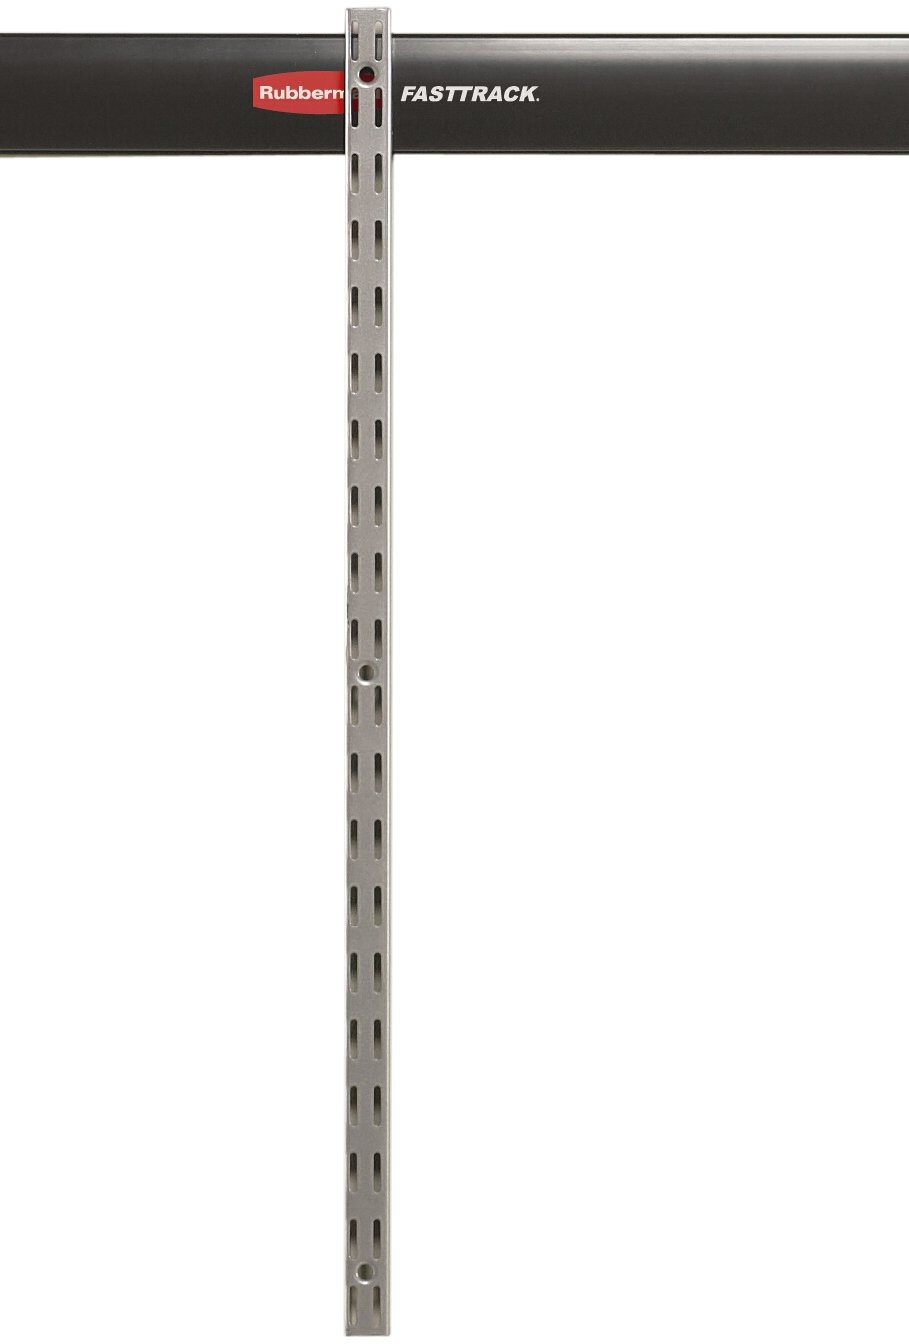 "Rubbermaid FastTrack Garage Storage System Upright Rail, 25"" (1784365)"